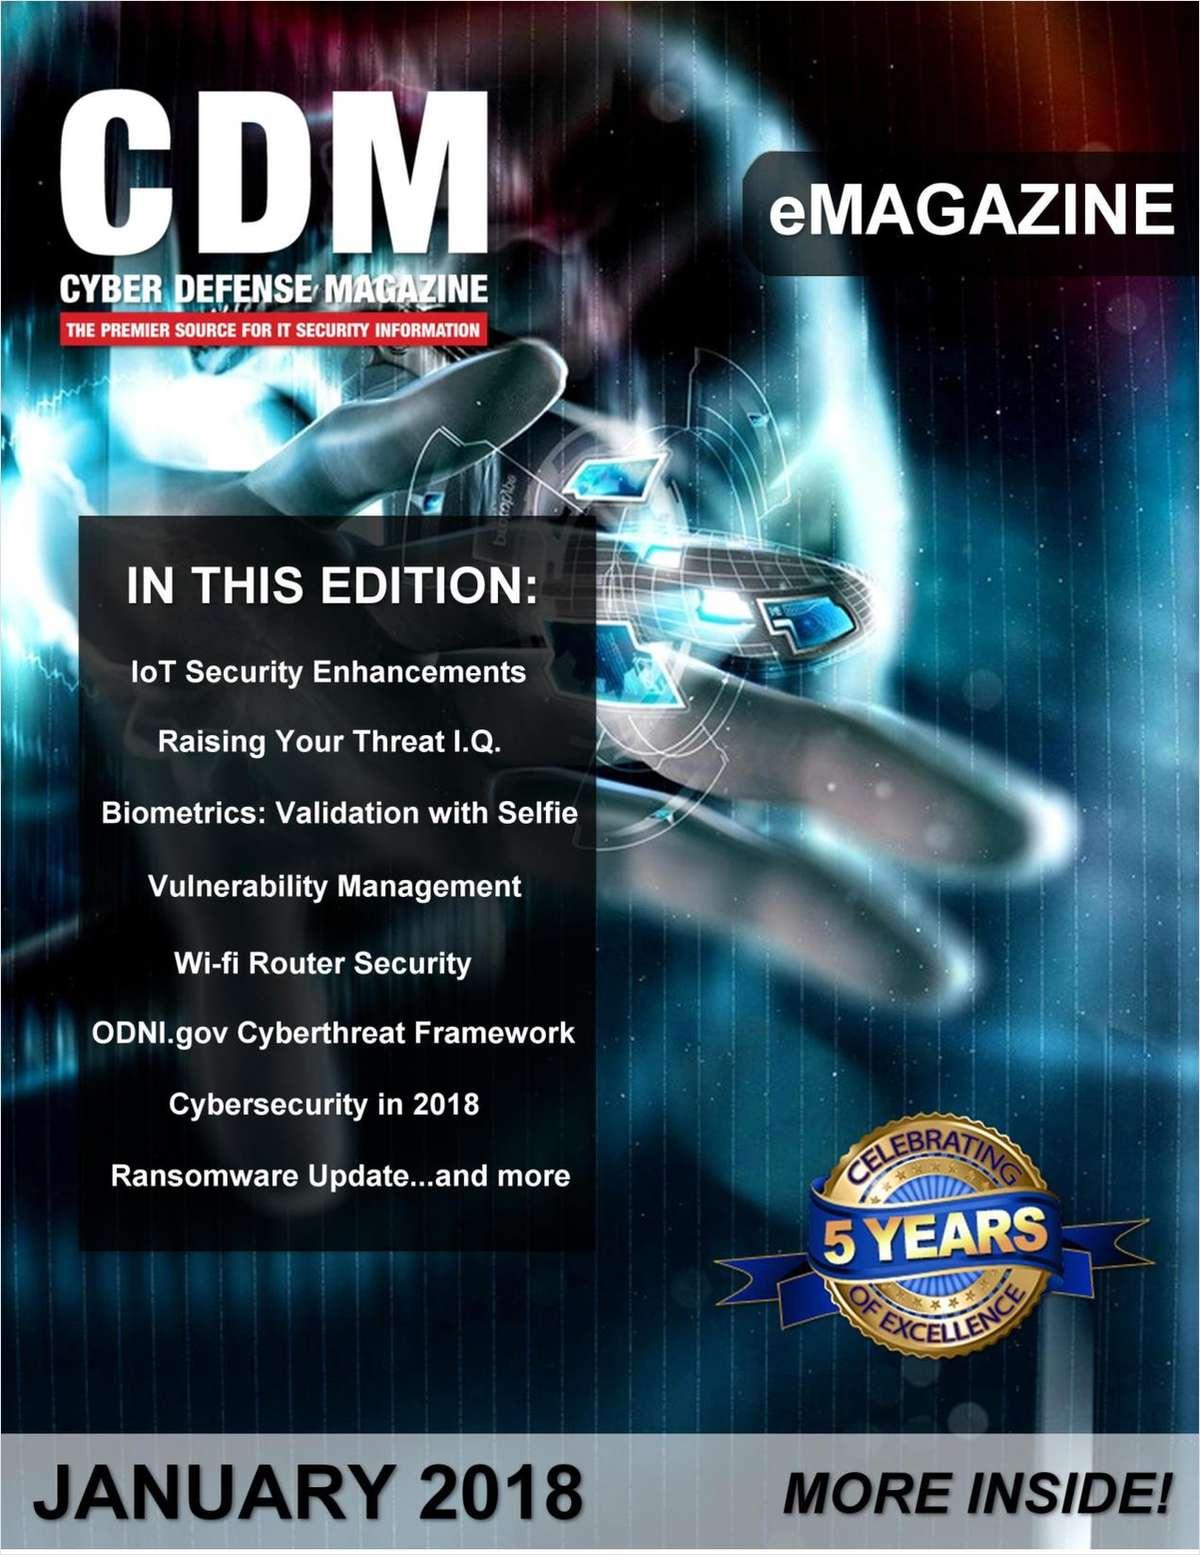 Cyber Defense Magazine - January 2018